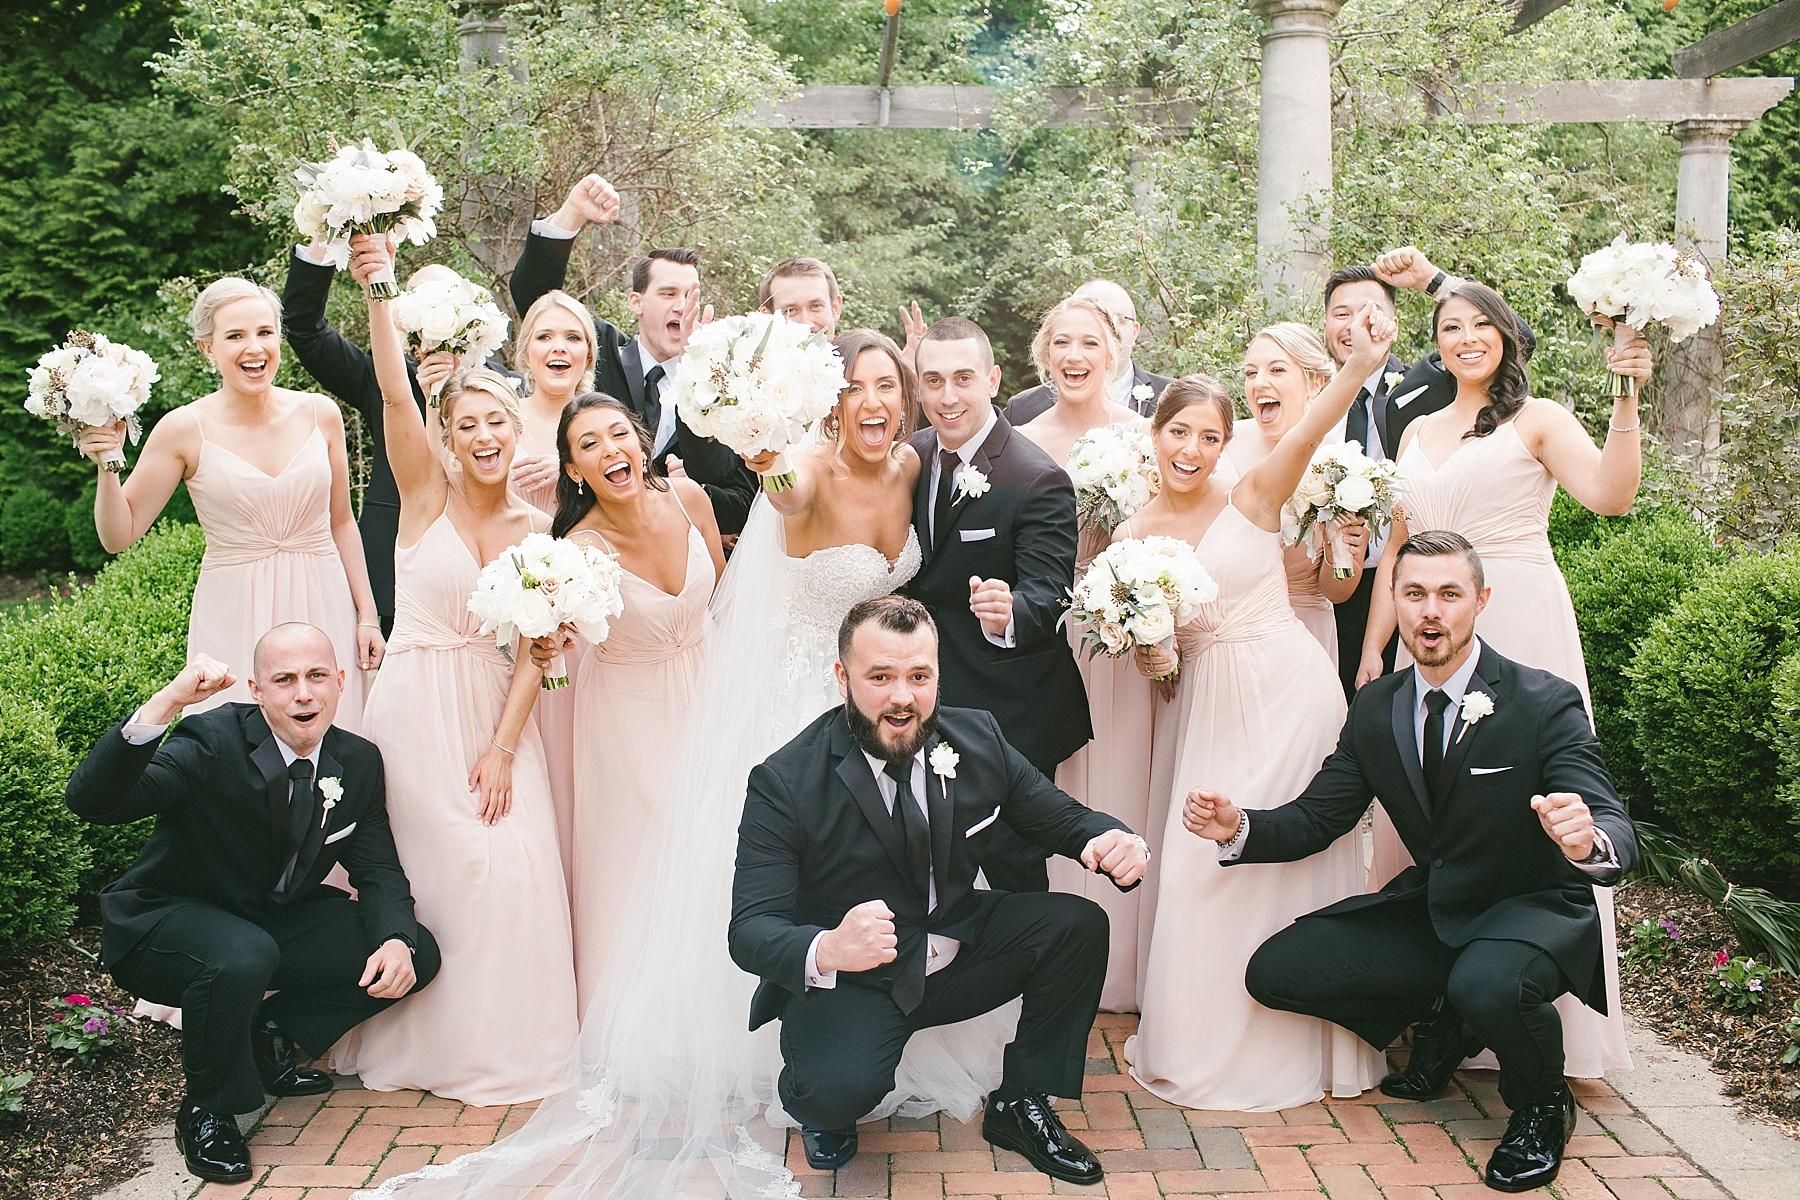 Ashley Mac Photographs | NJ wedding Photographer | The Estate at Florentine Gardens wedding | River Vale NJ wedding day | New Jersey wedding photographer, wedding photography, The Estate at Florentine Gardens, classic wedding day, romantic wedding day